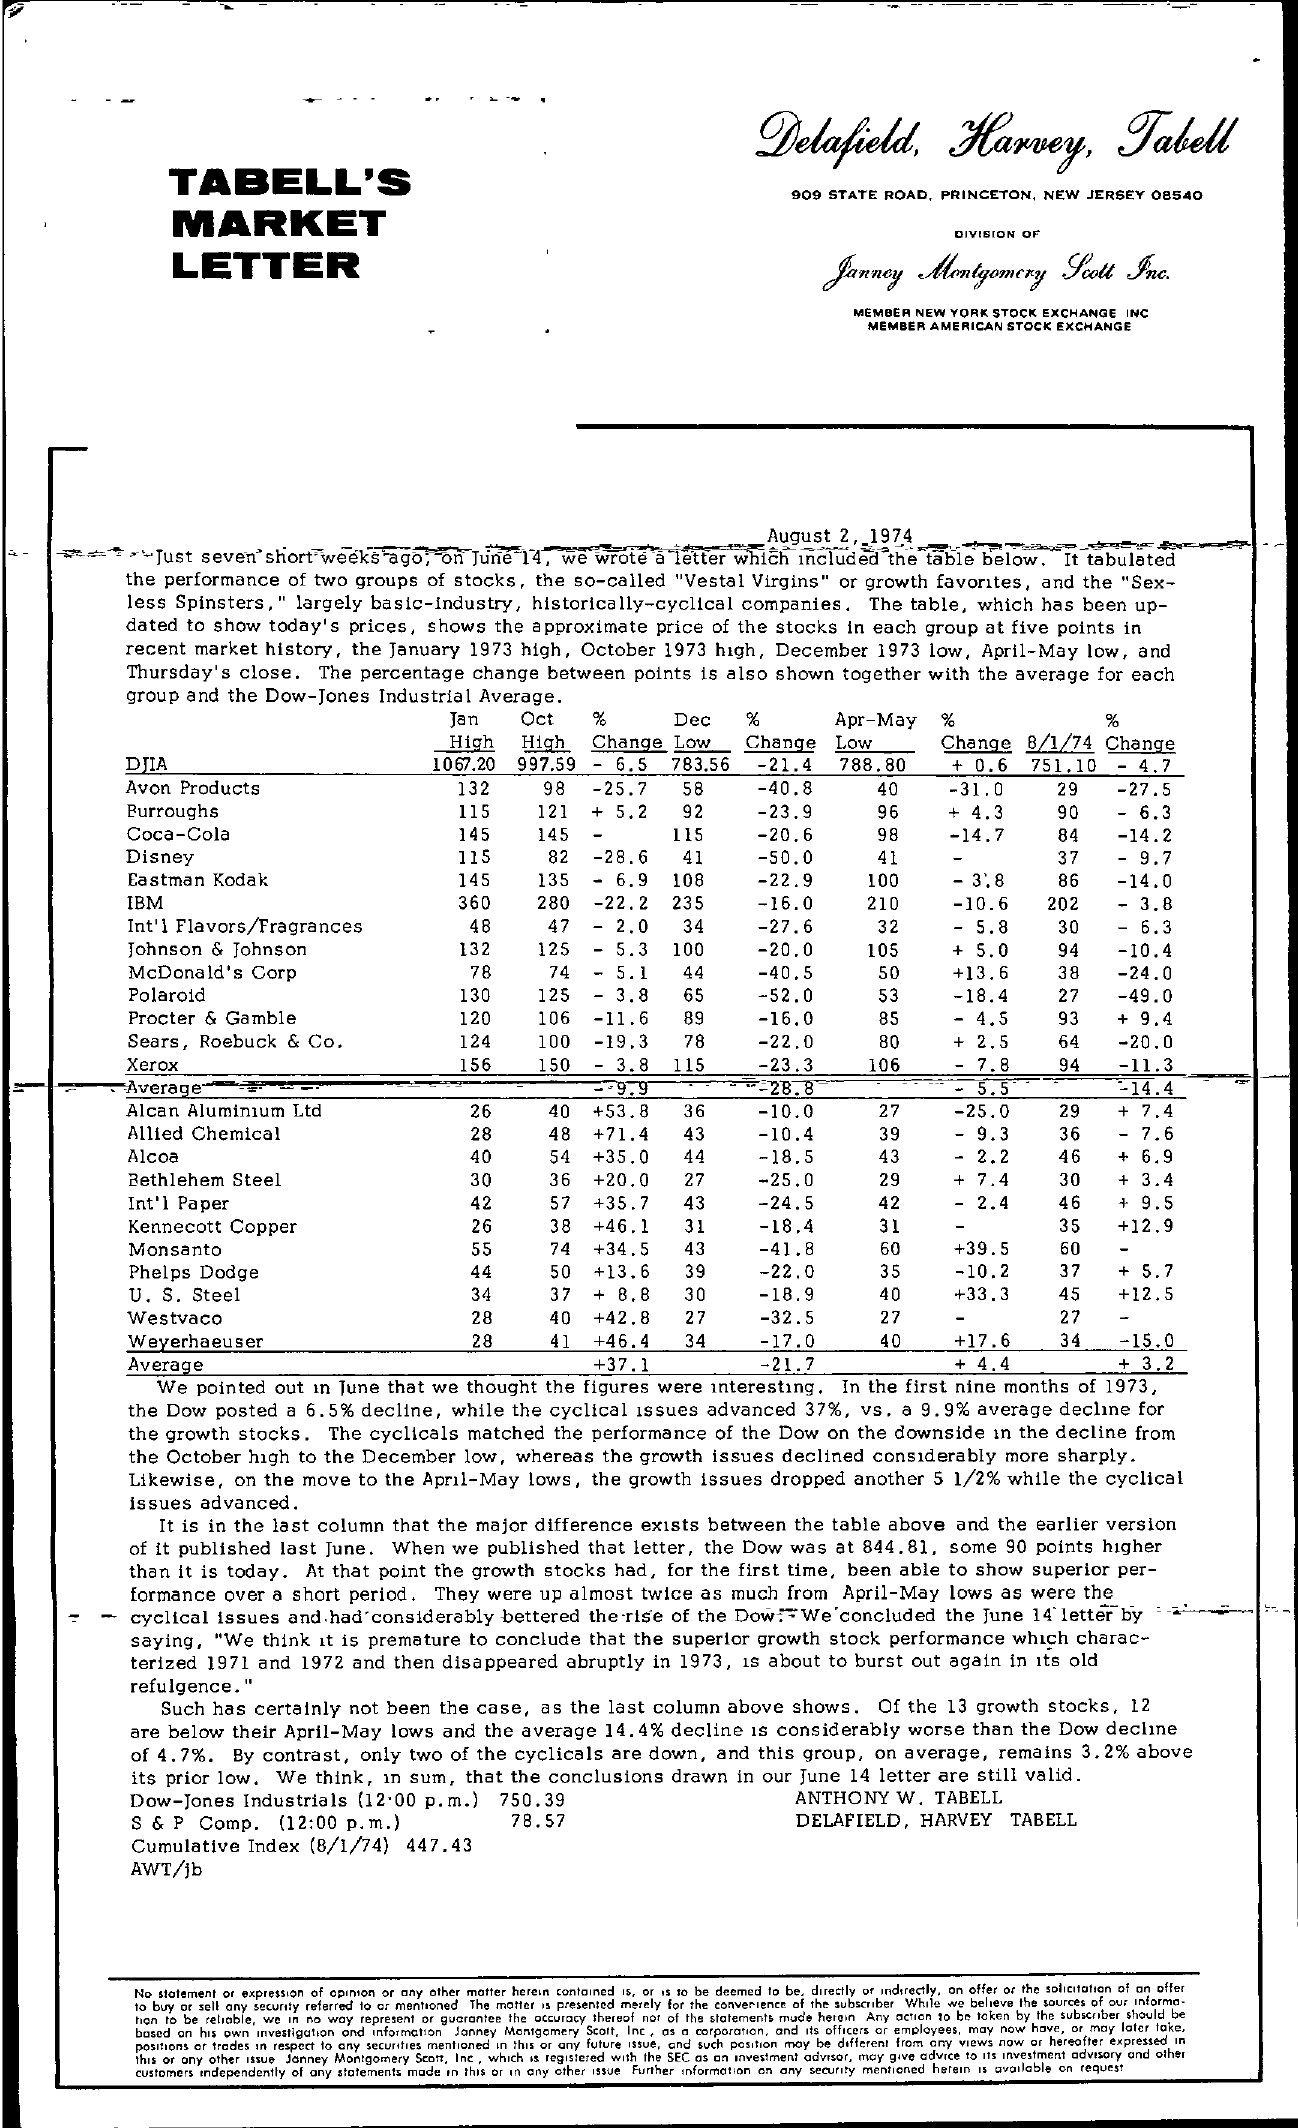 Tabell's Market Letter - August 02, 1974